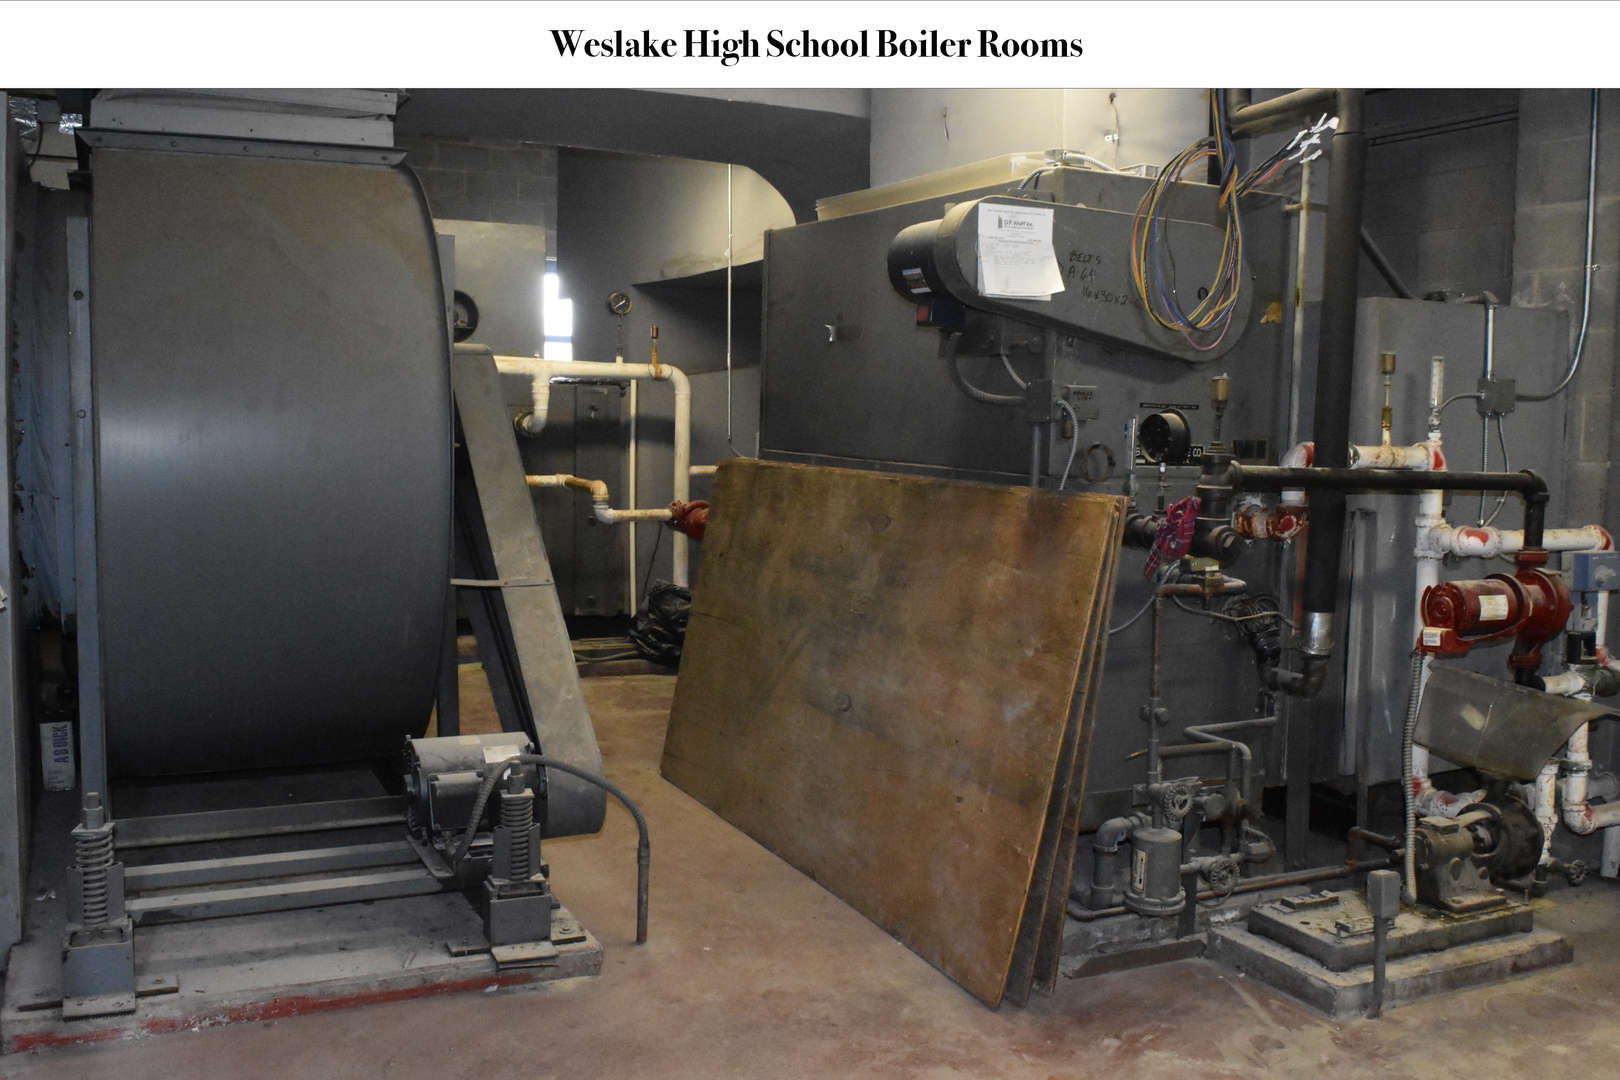 WHS Boiler Room before renovation